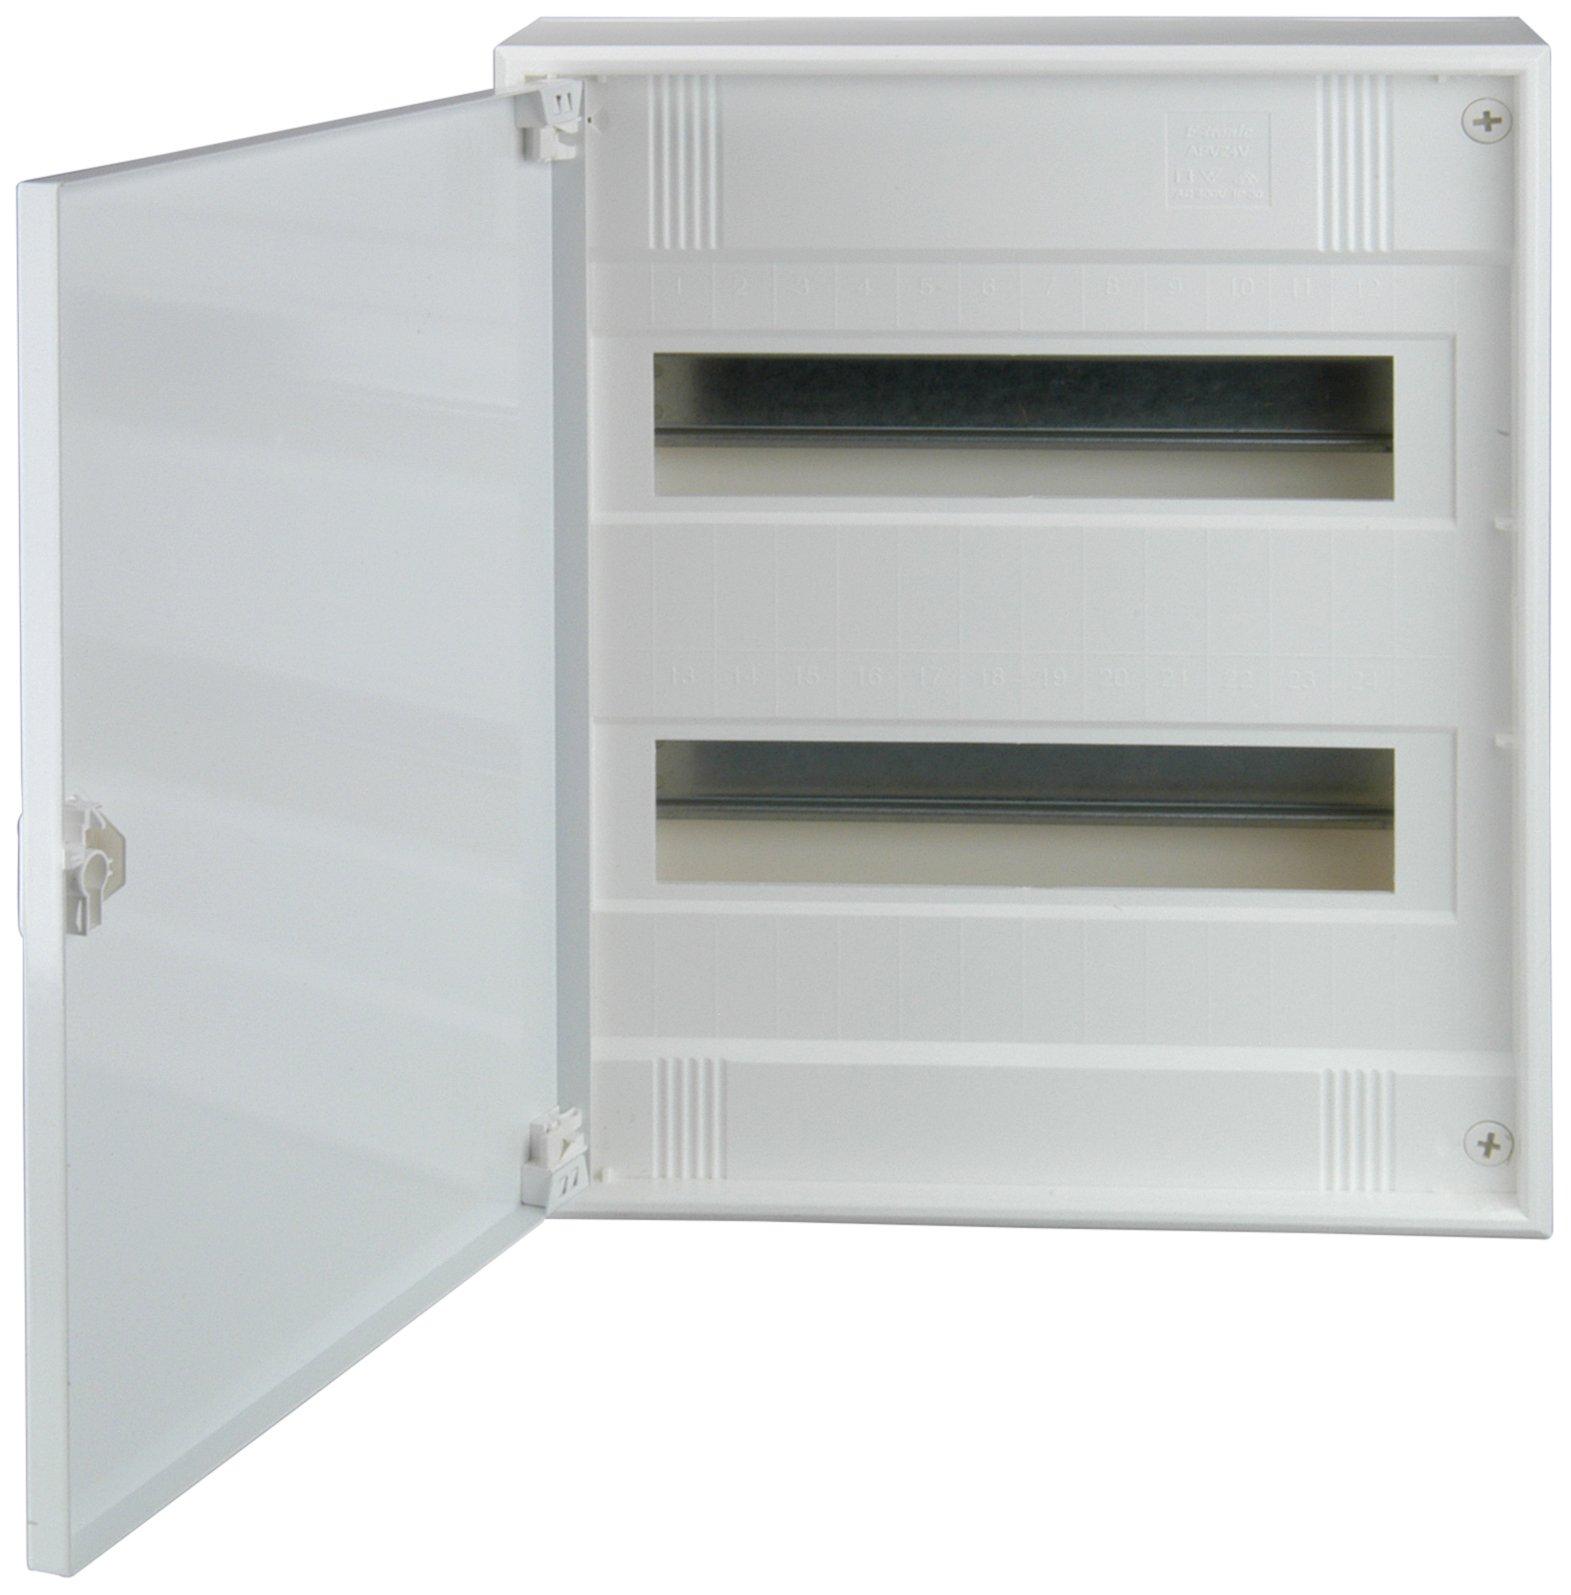 Unitec 47595Surface-Mounted Distribution, 2-row with Steel Door